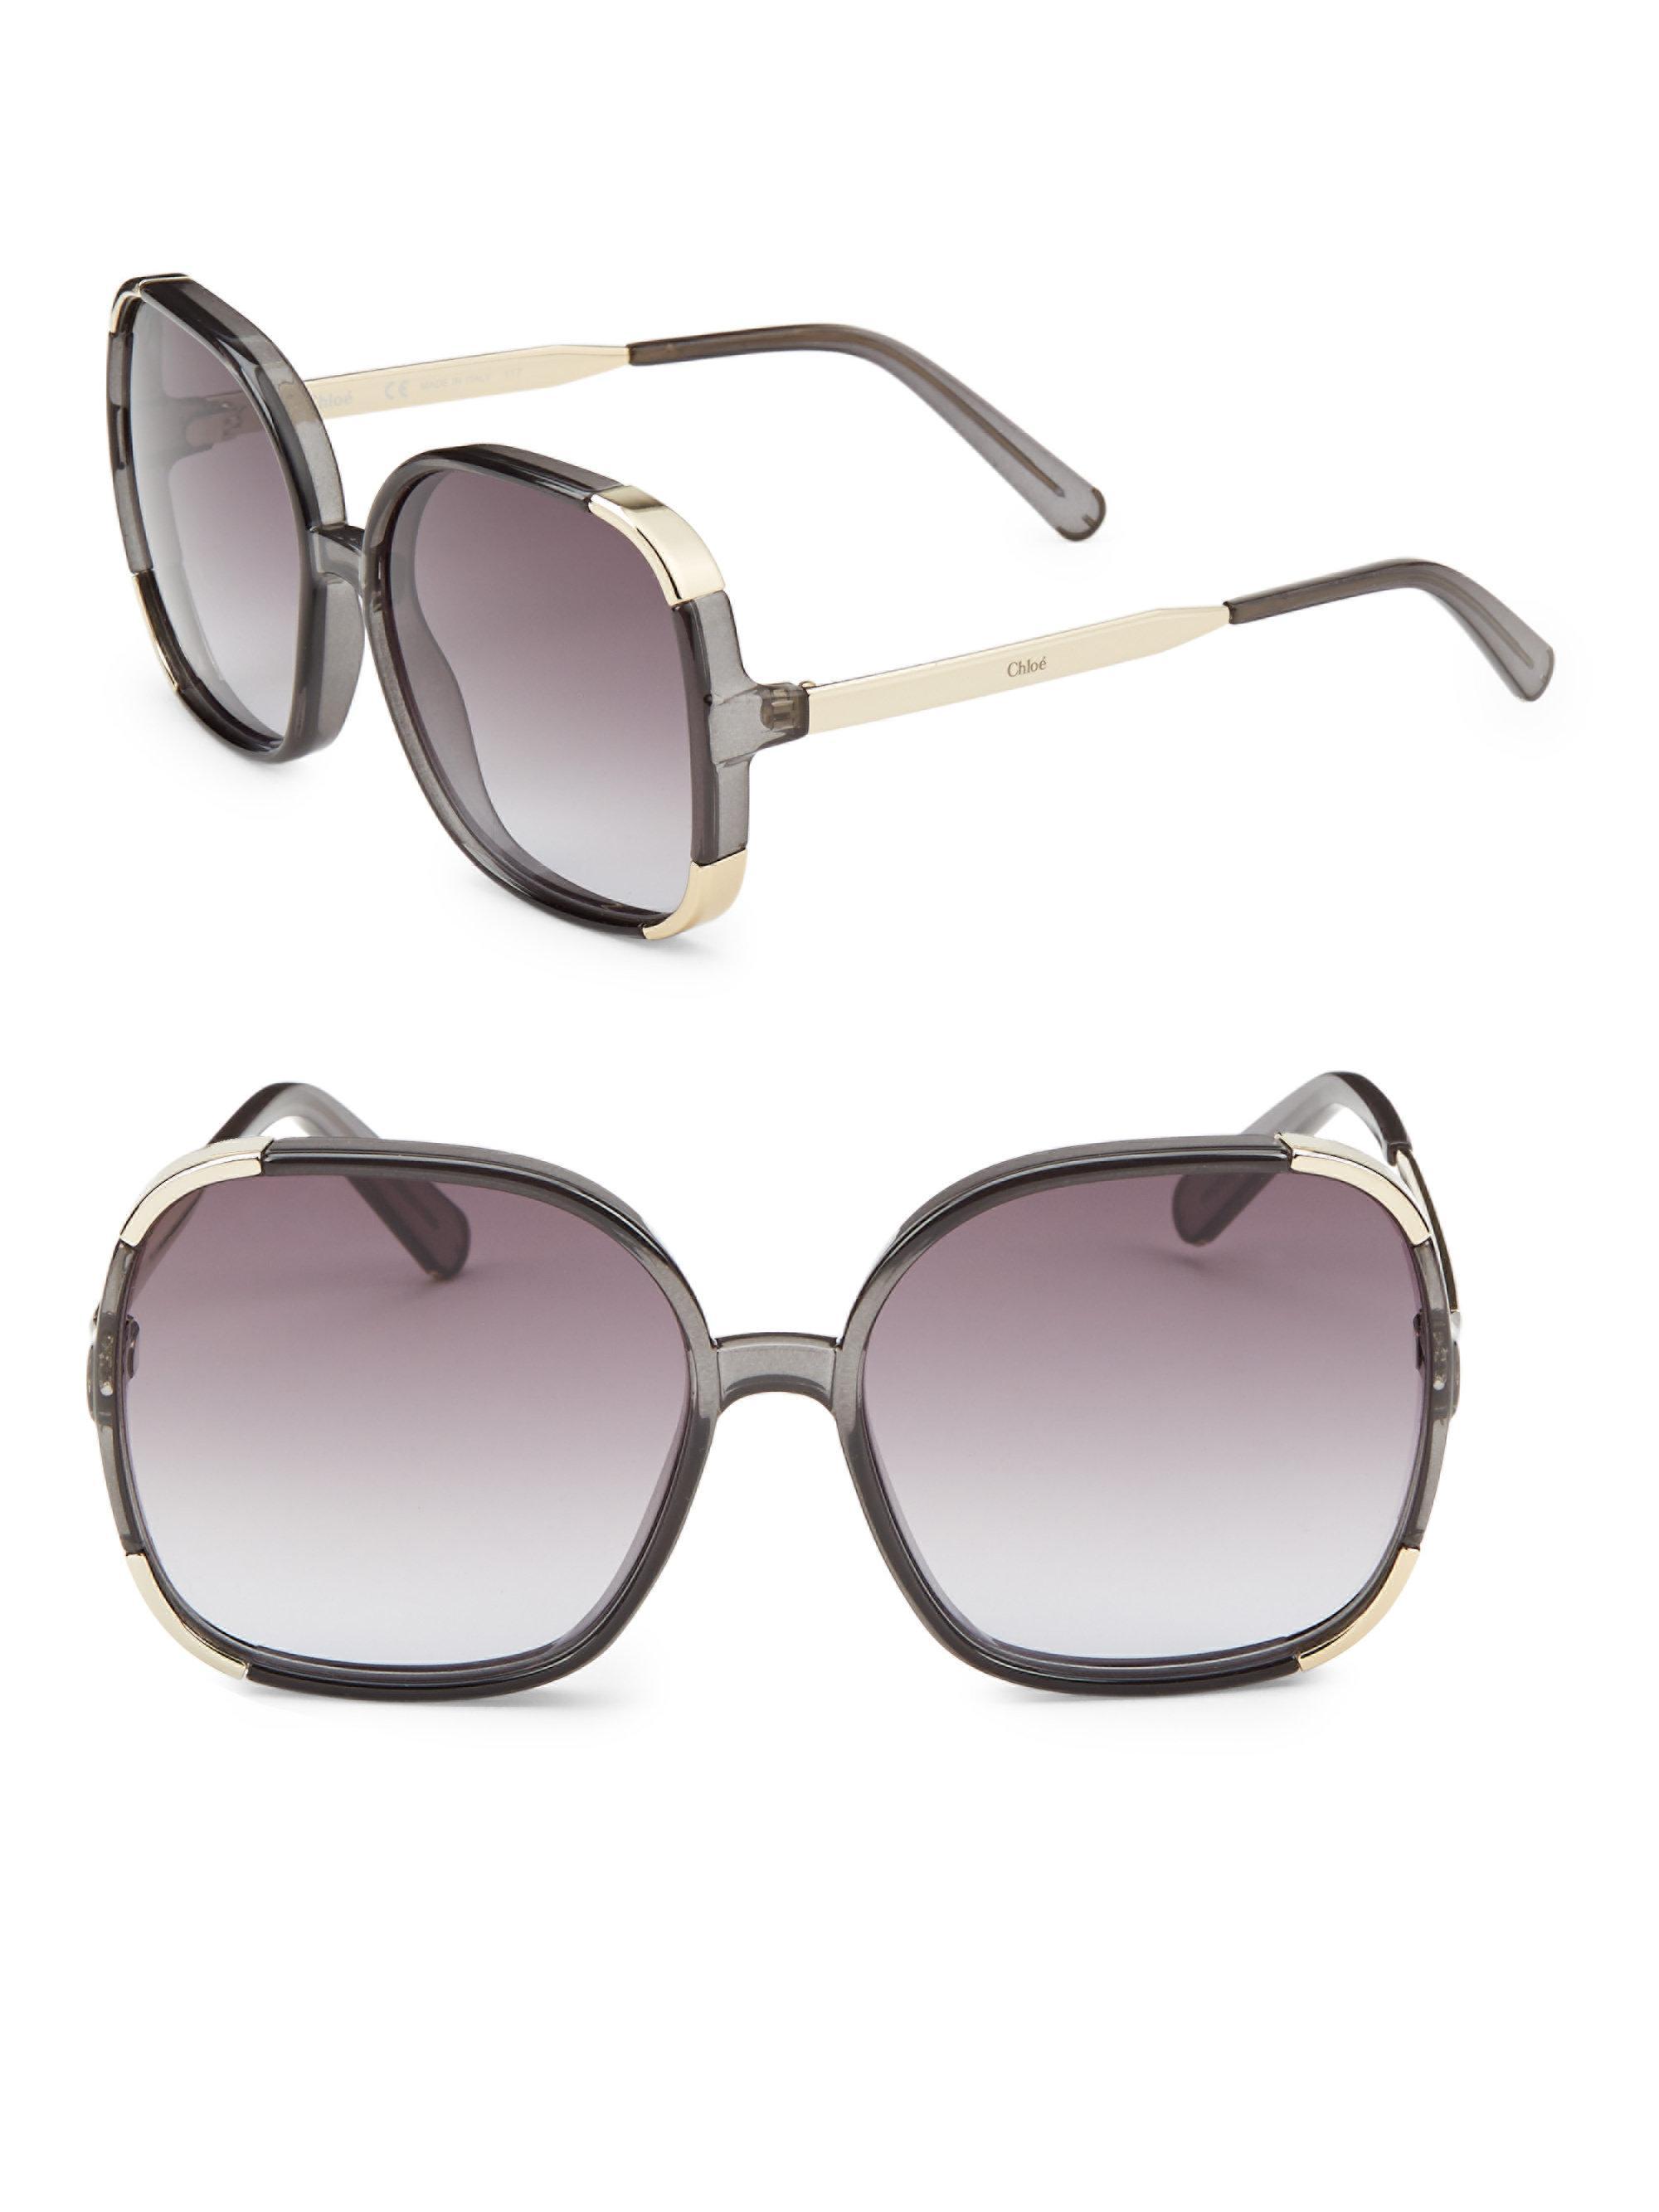 Chlo 233 Tinted 62mm Square Sunglasses In Dark Grey Gray Lyst